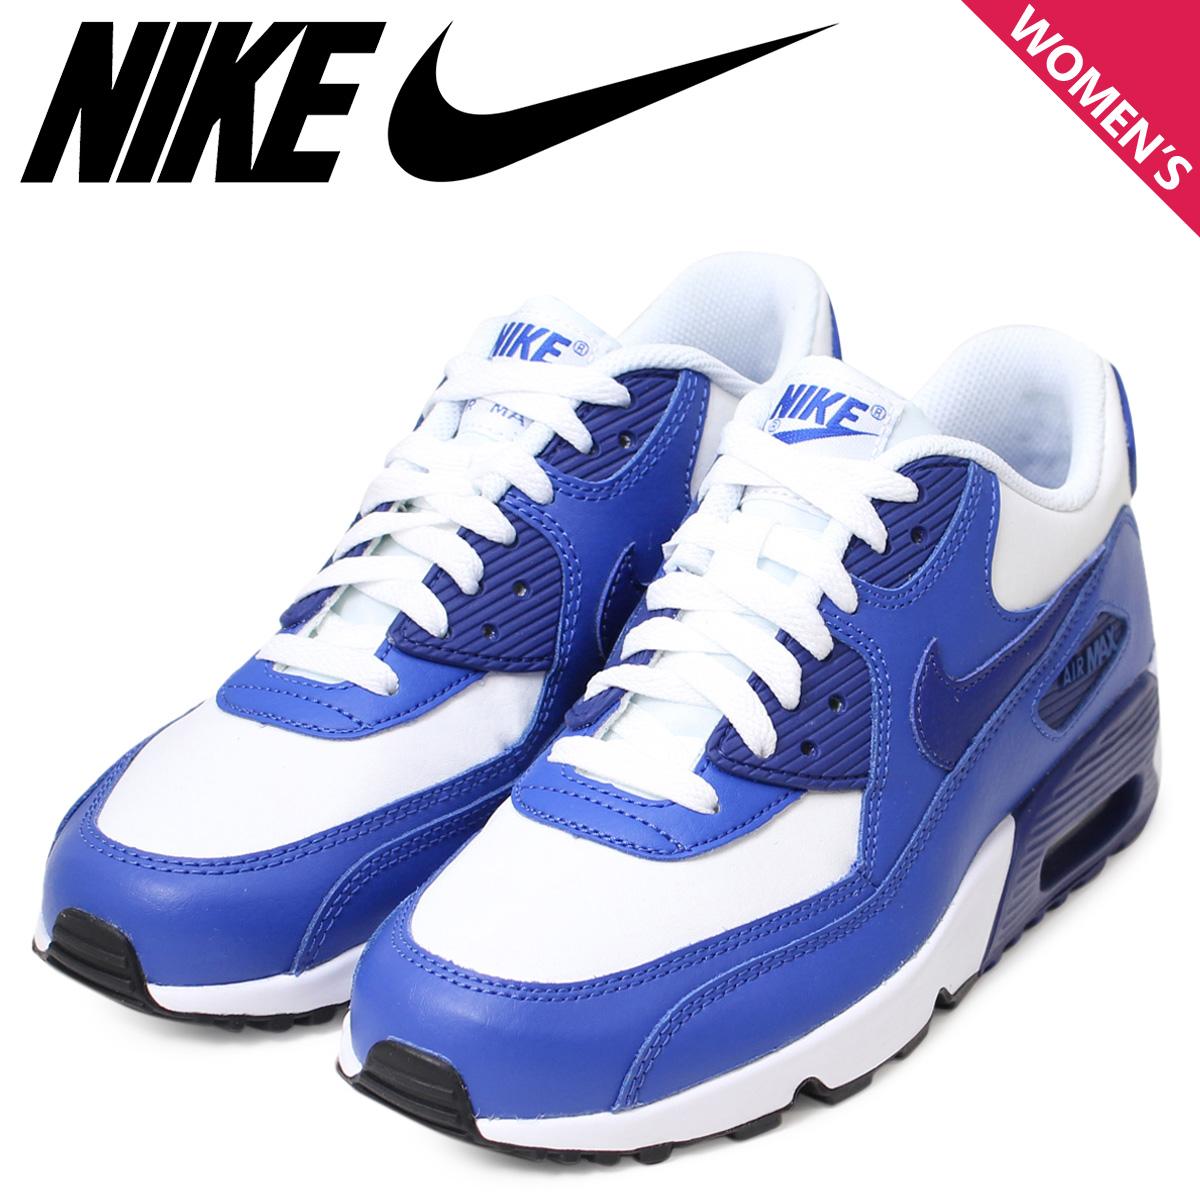 Nike Air Max ´90 Essential | Blanc | Baskets | AJ1285 105